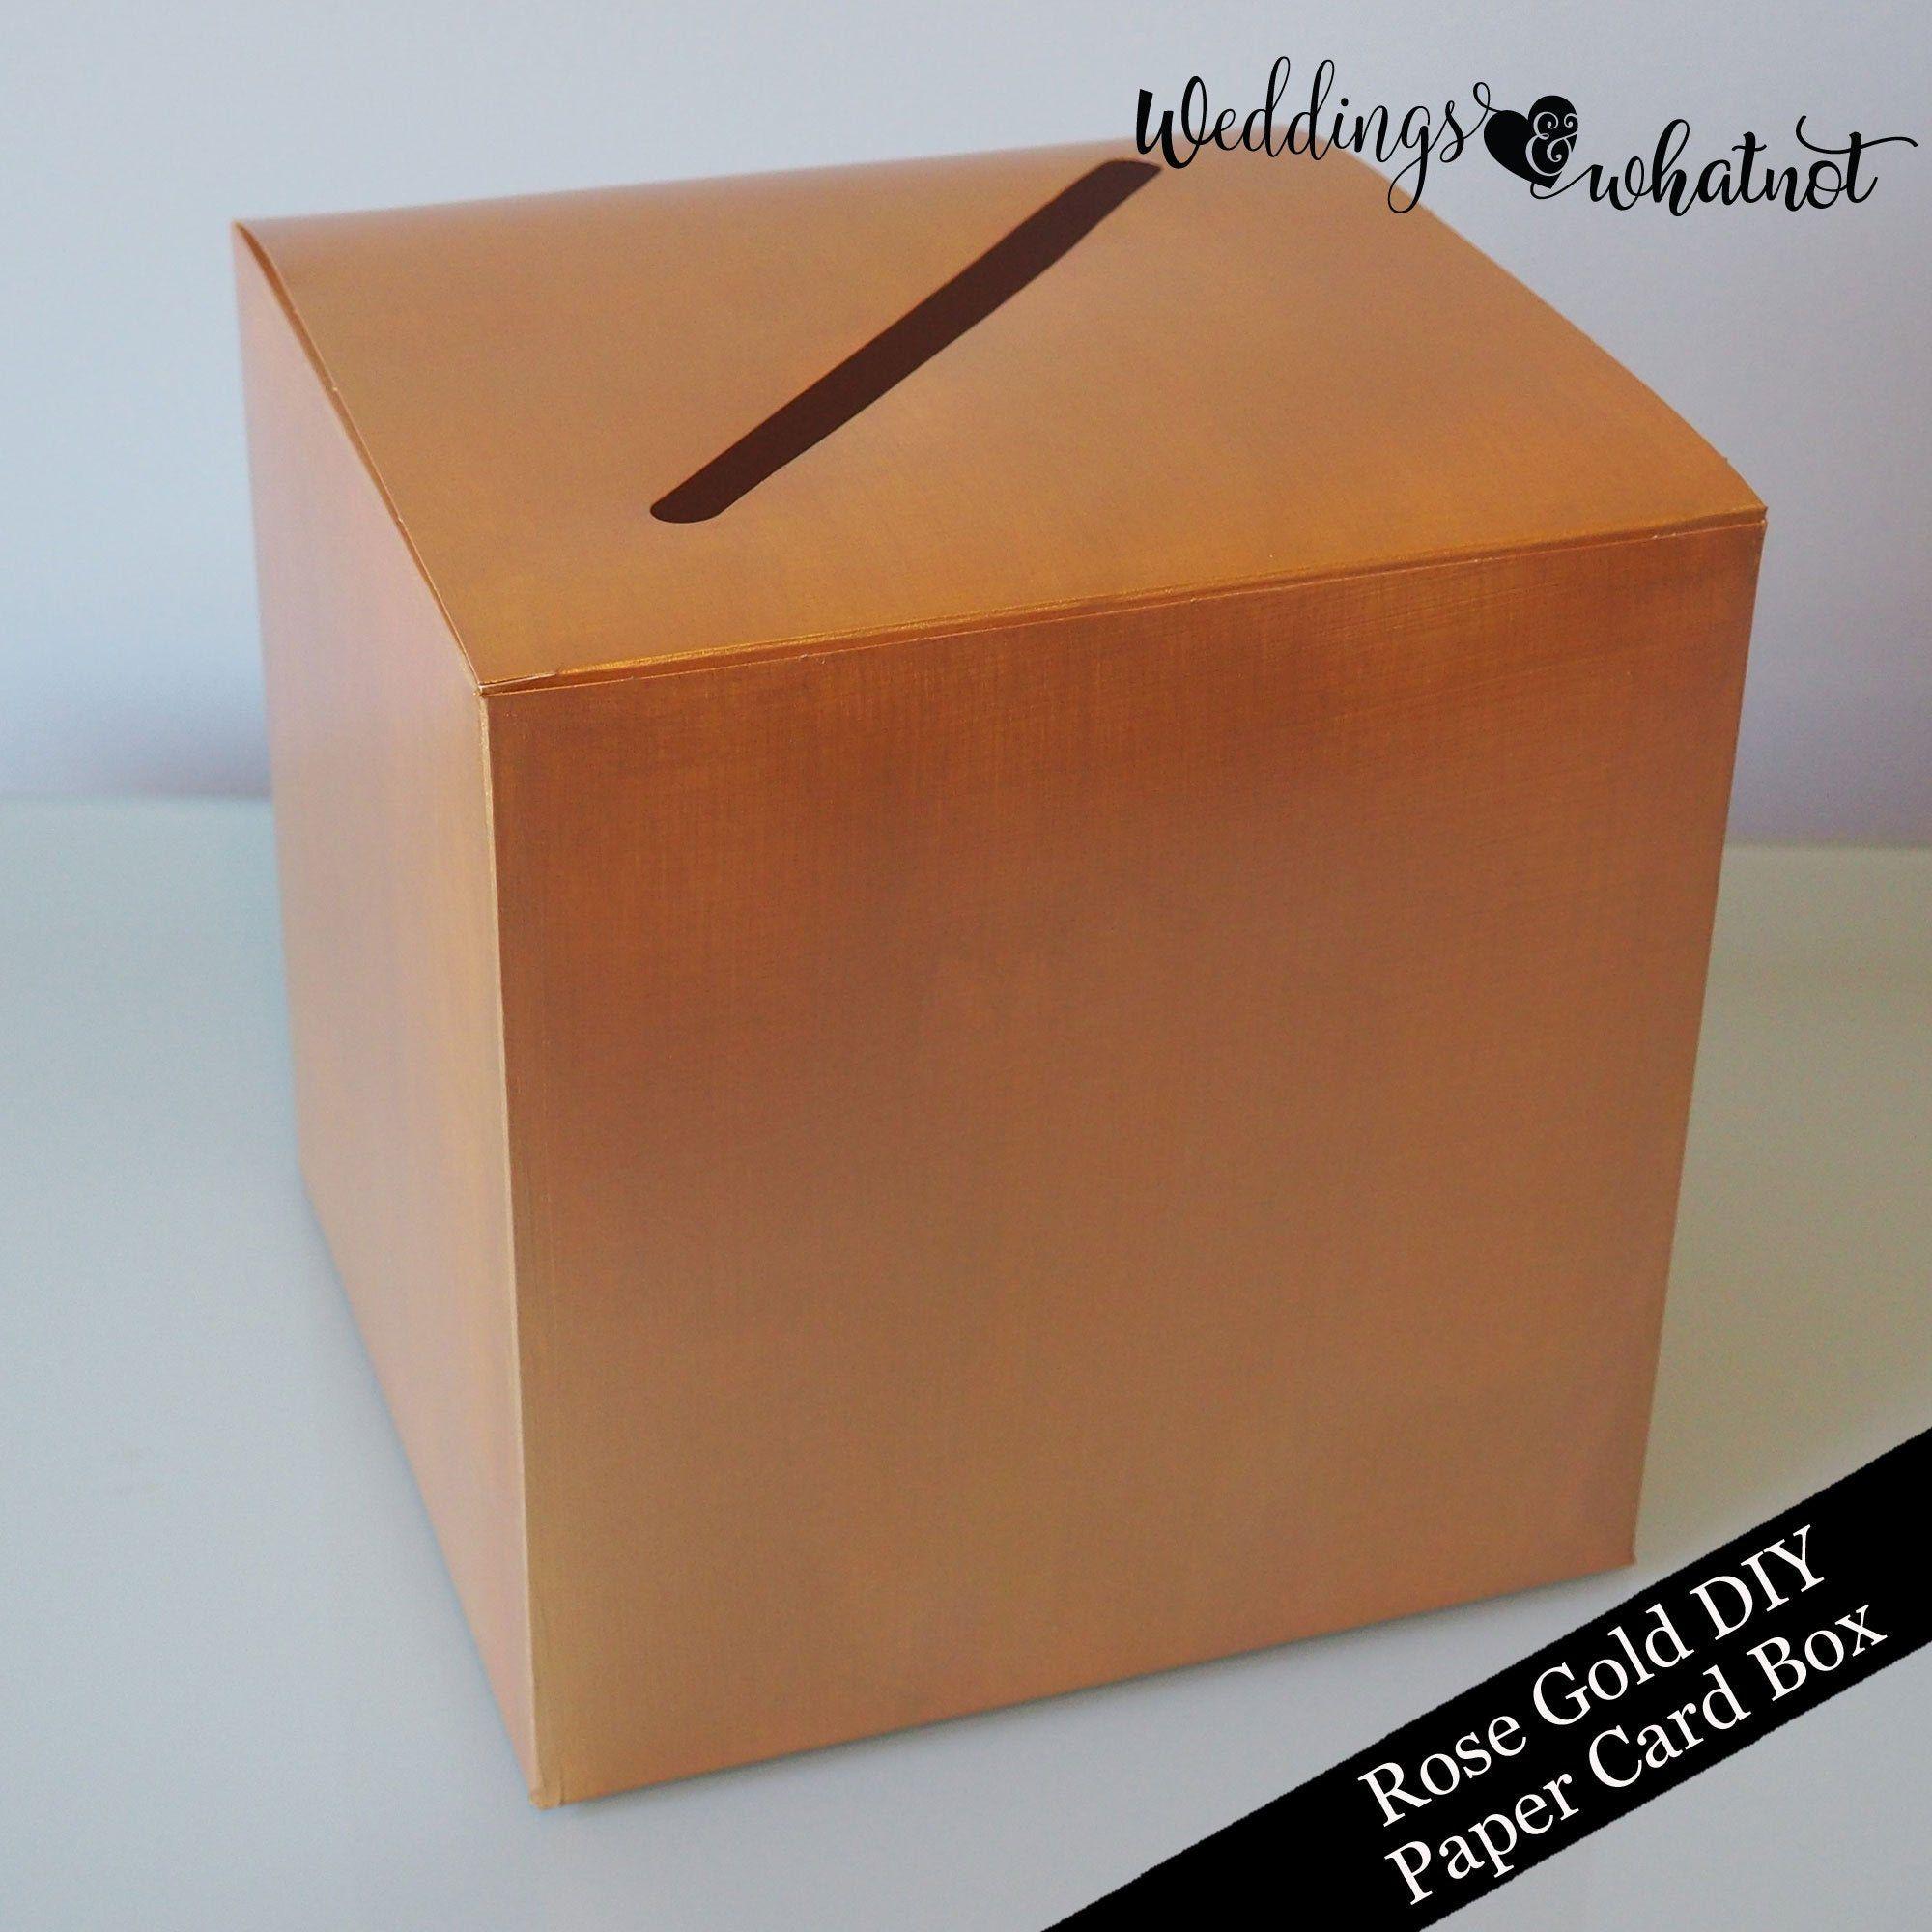 Rose Gold Diy Paper Card Box Card Holder Etsy Card Box Holder Card Box Diy Paper